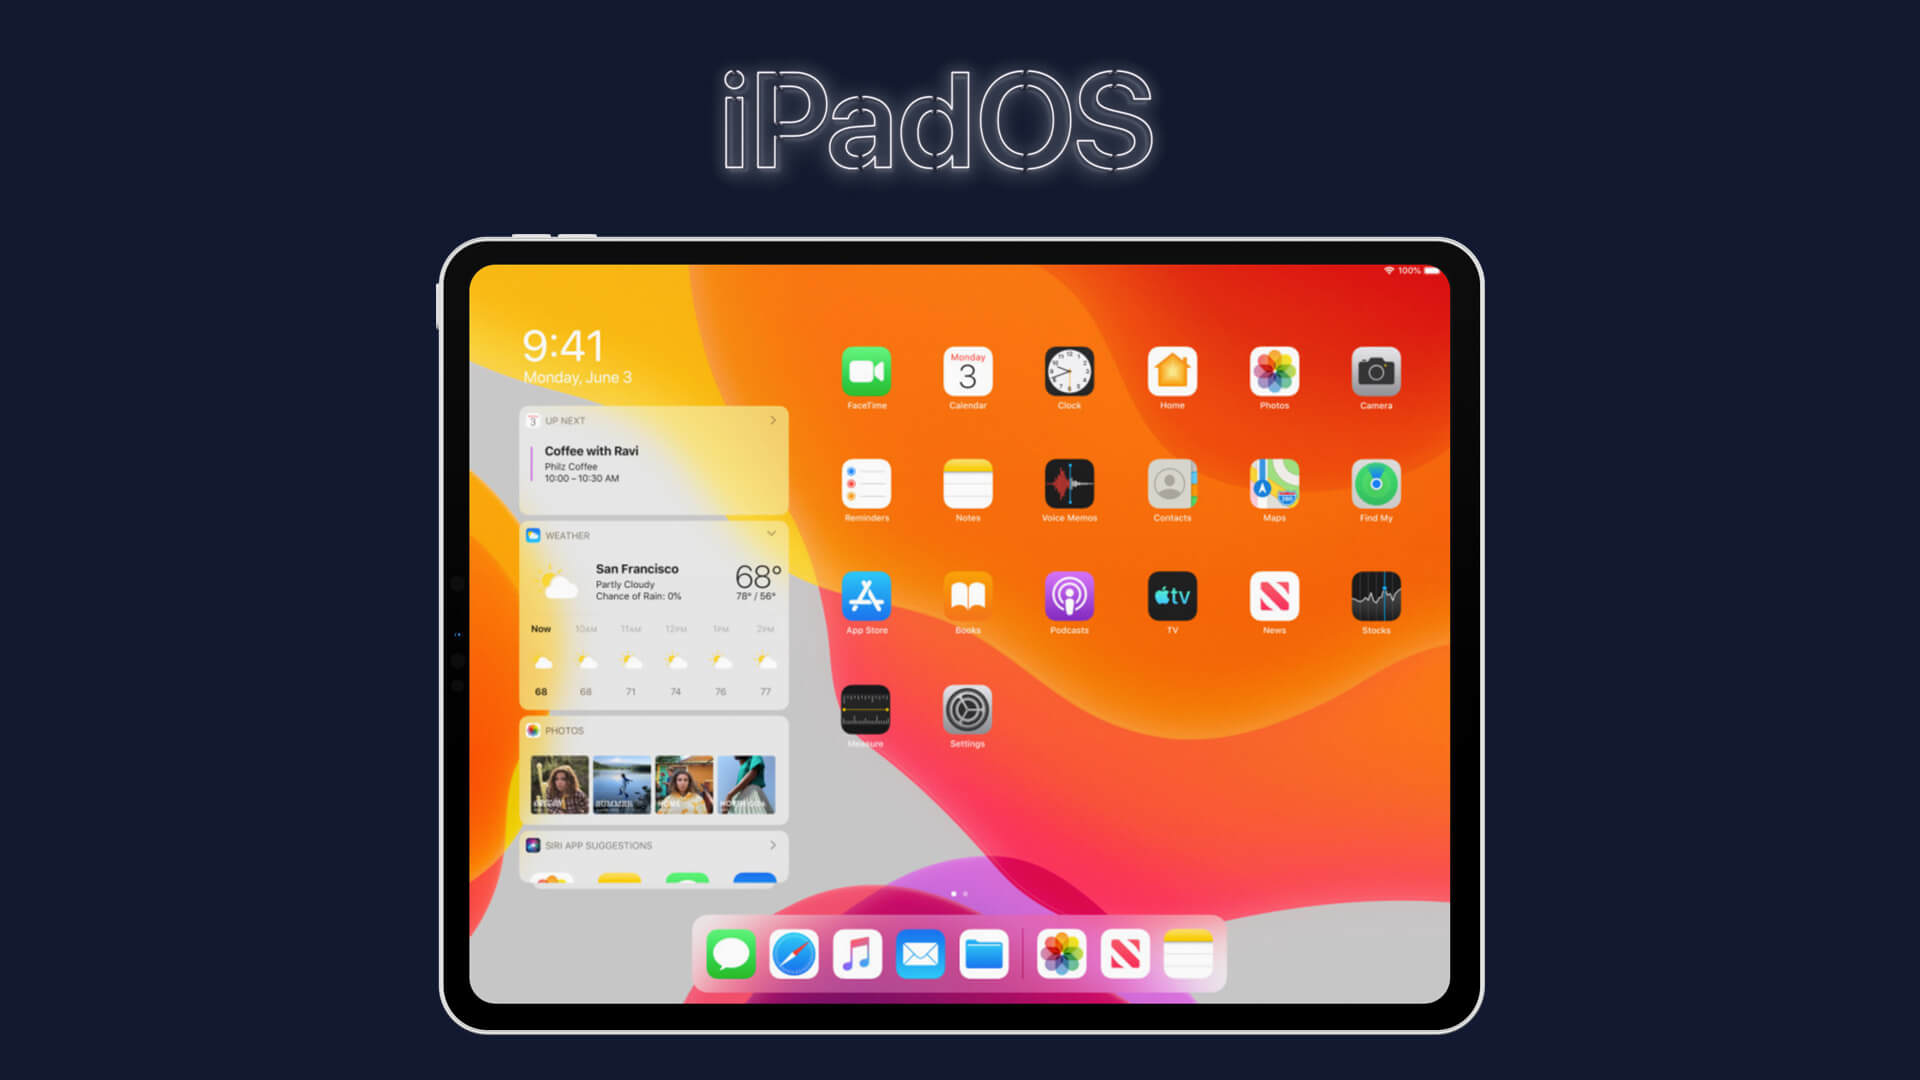 Apple iPadOS 13 Features